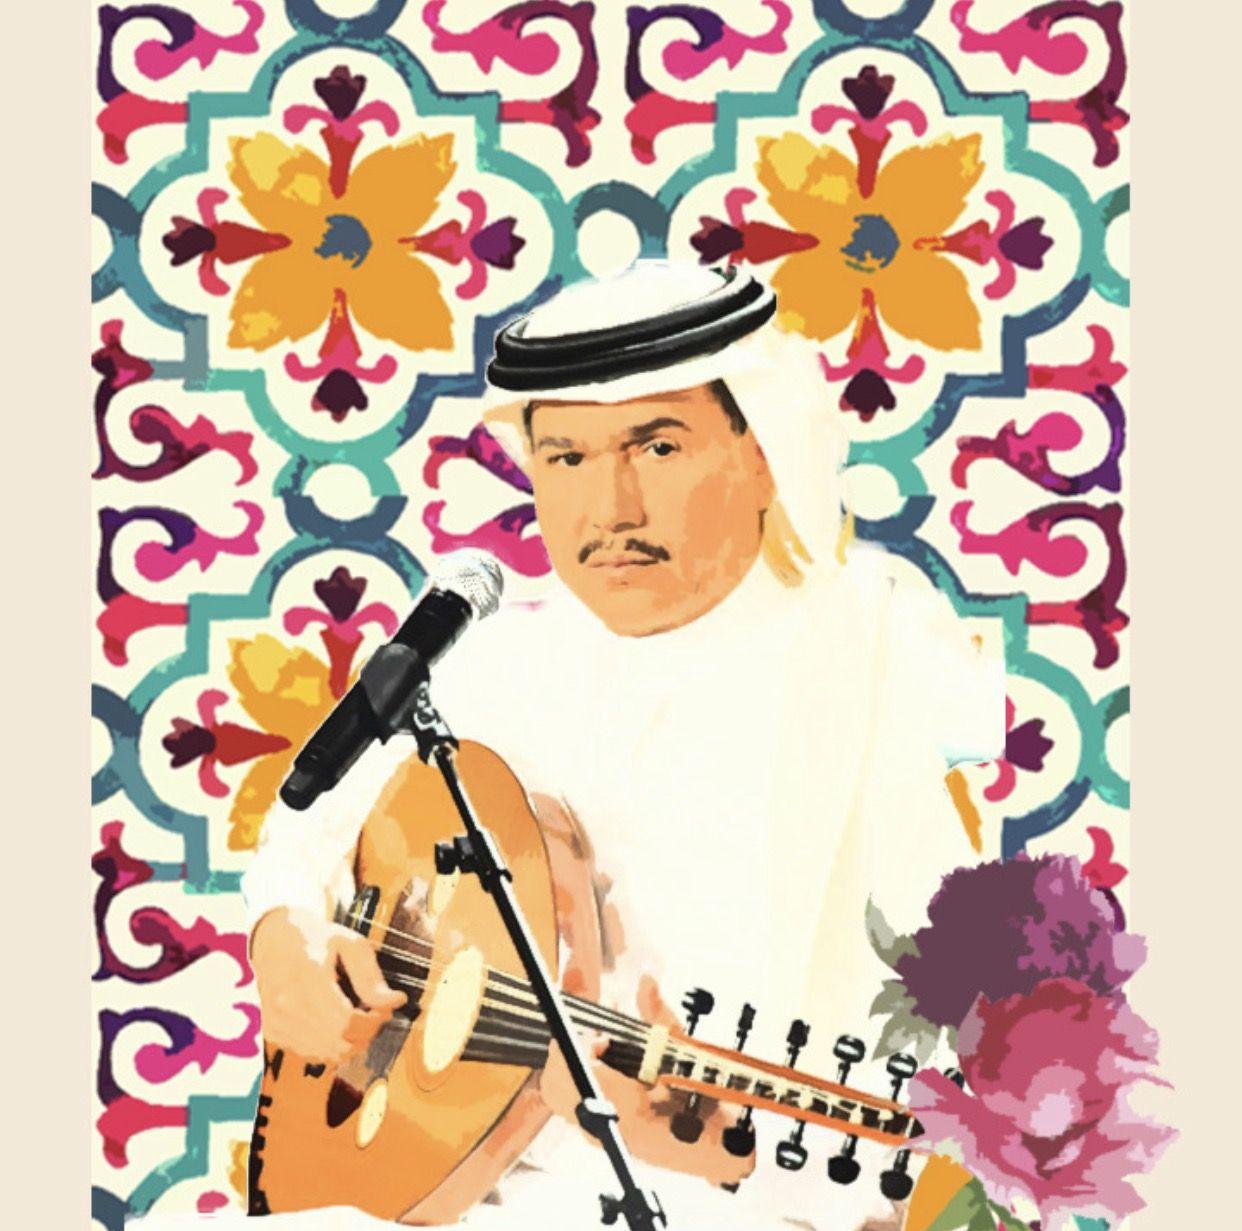 محمد عبده Graphic Art Prints Pop Art Portraits Pop Art